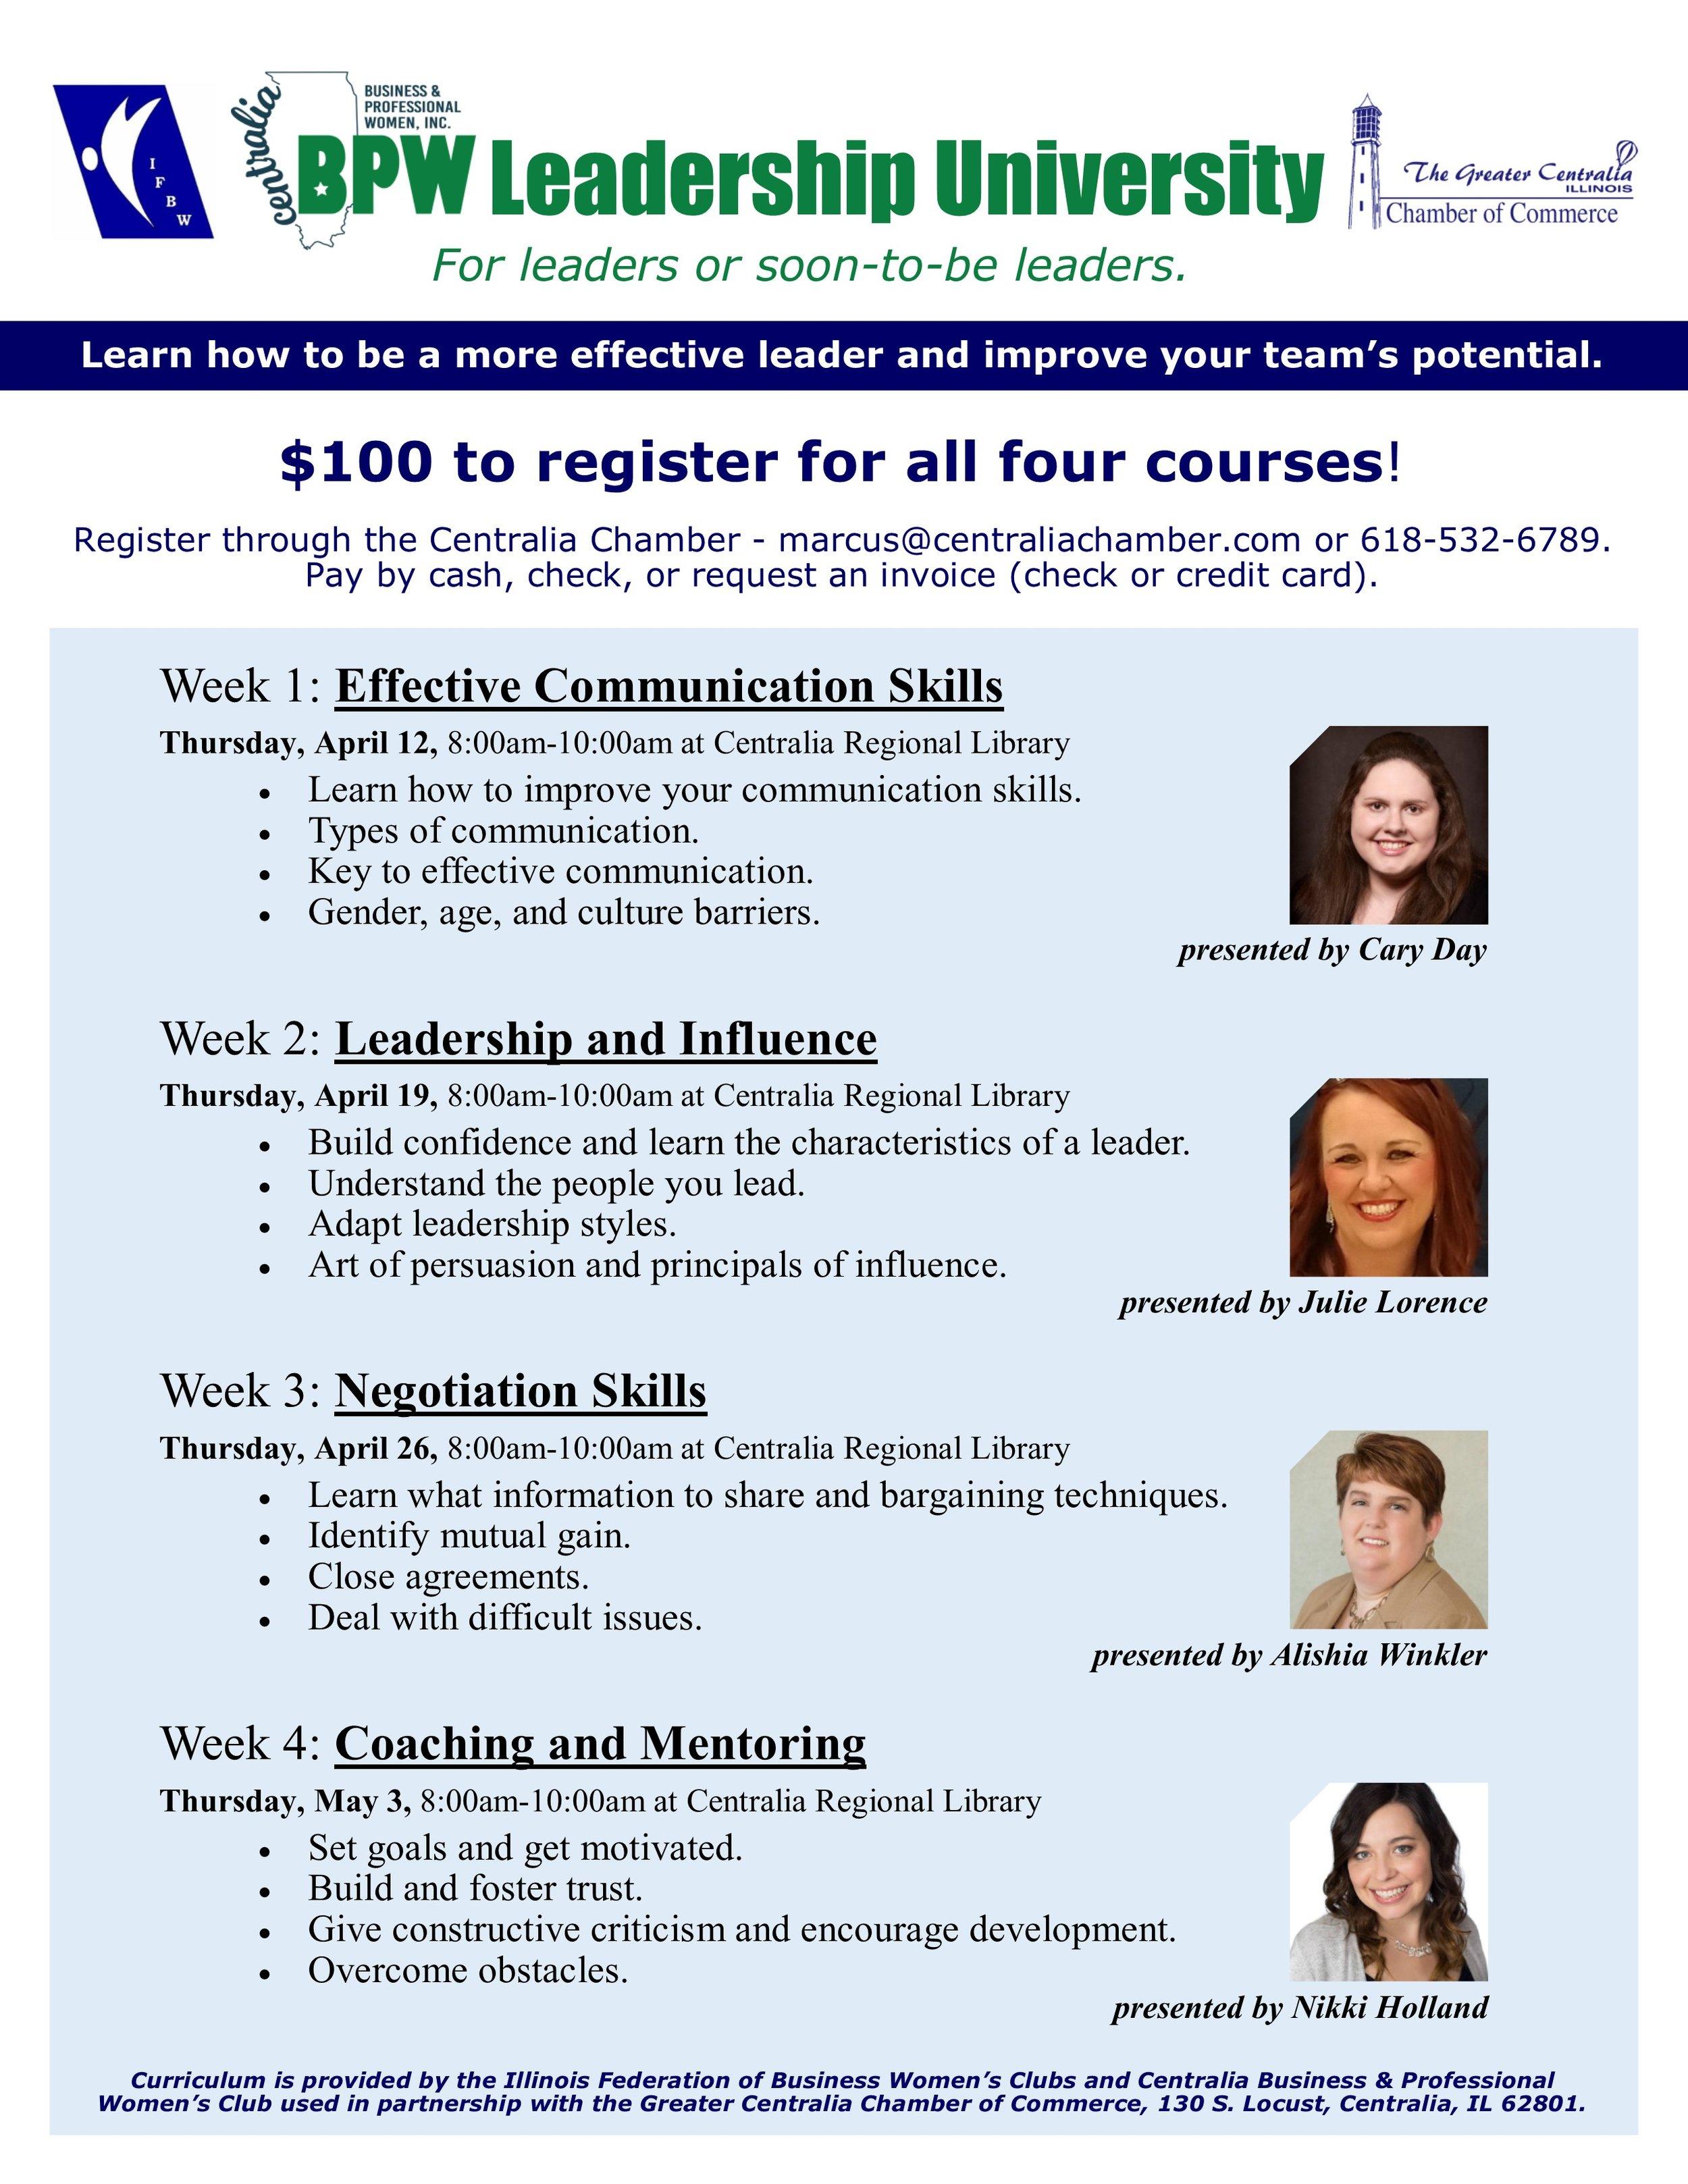 BPW Leadership University Classes.jpg